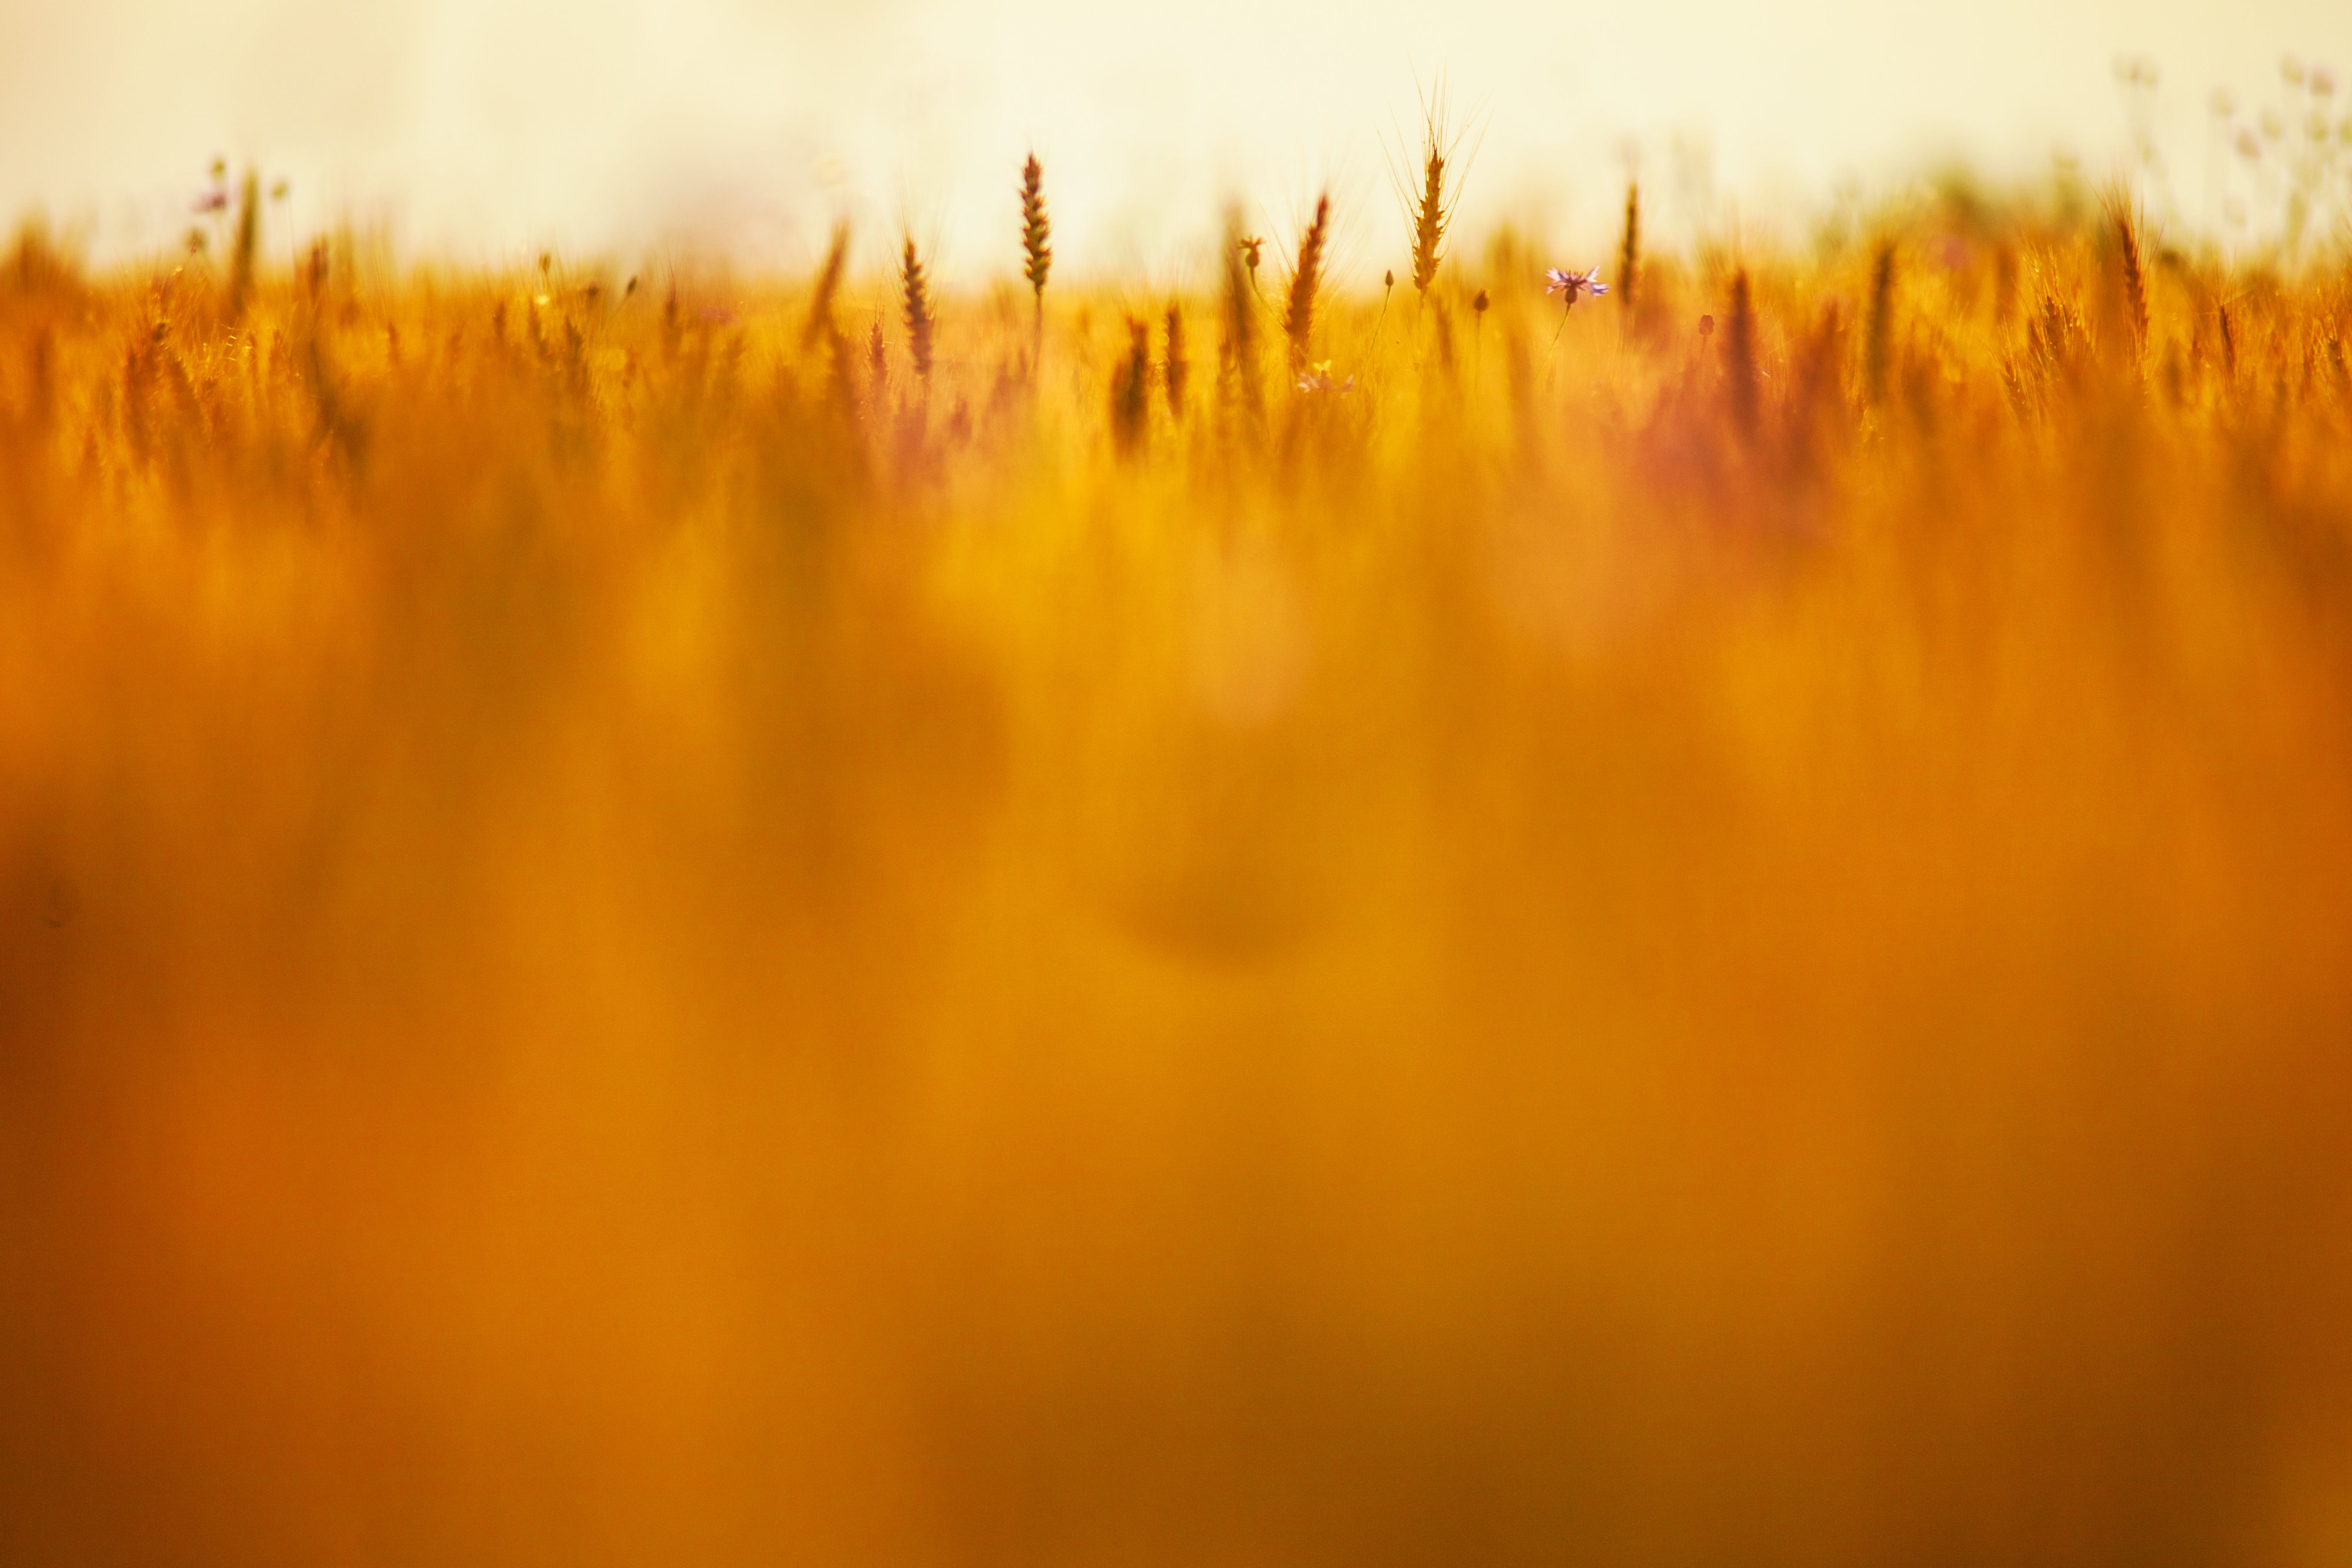 Wheat Field Under Sunny Sky